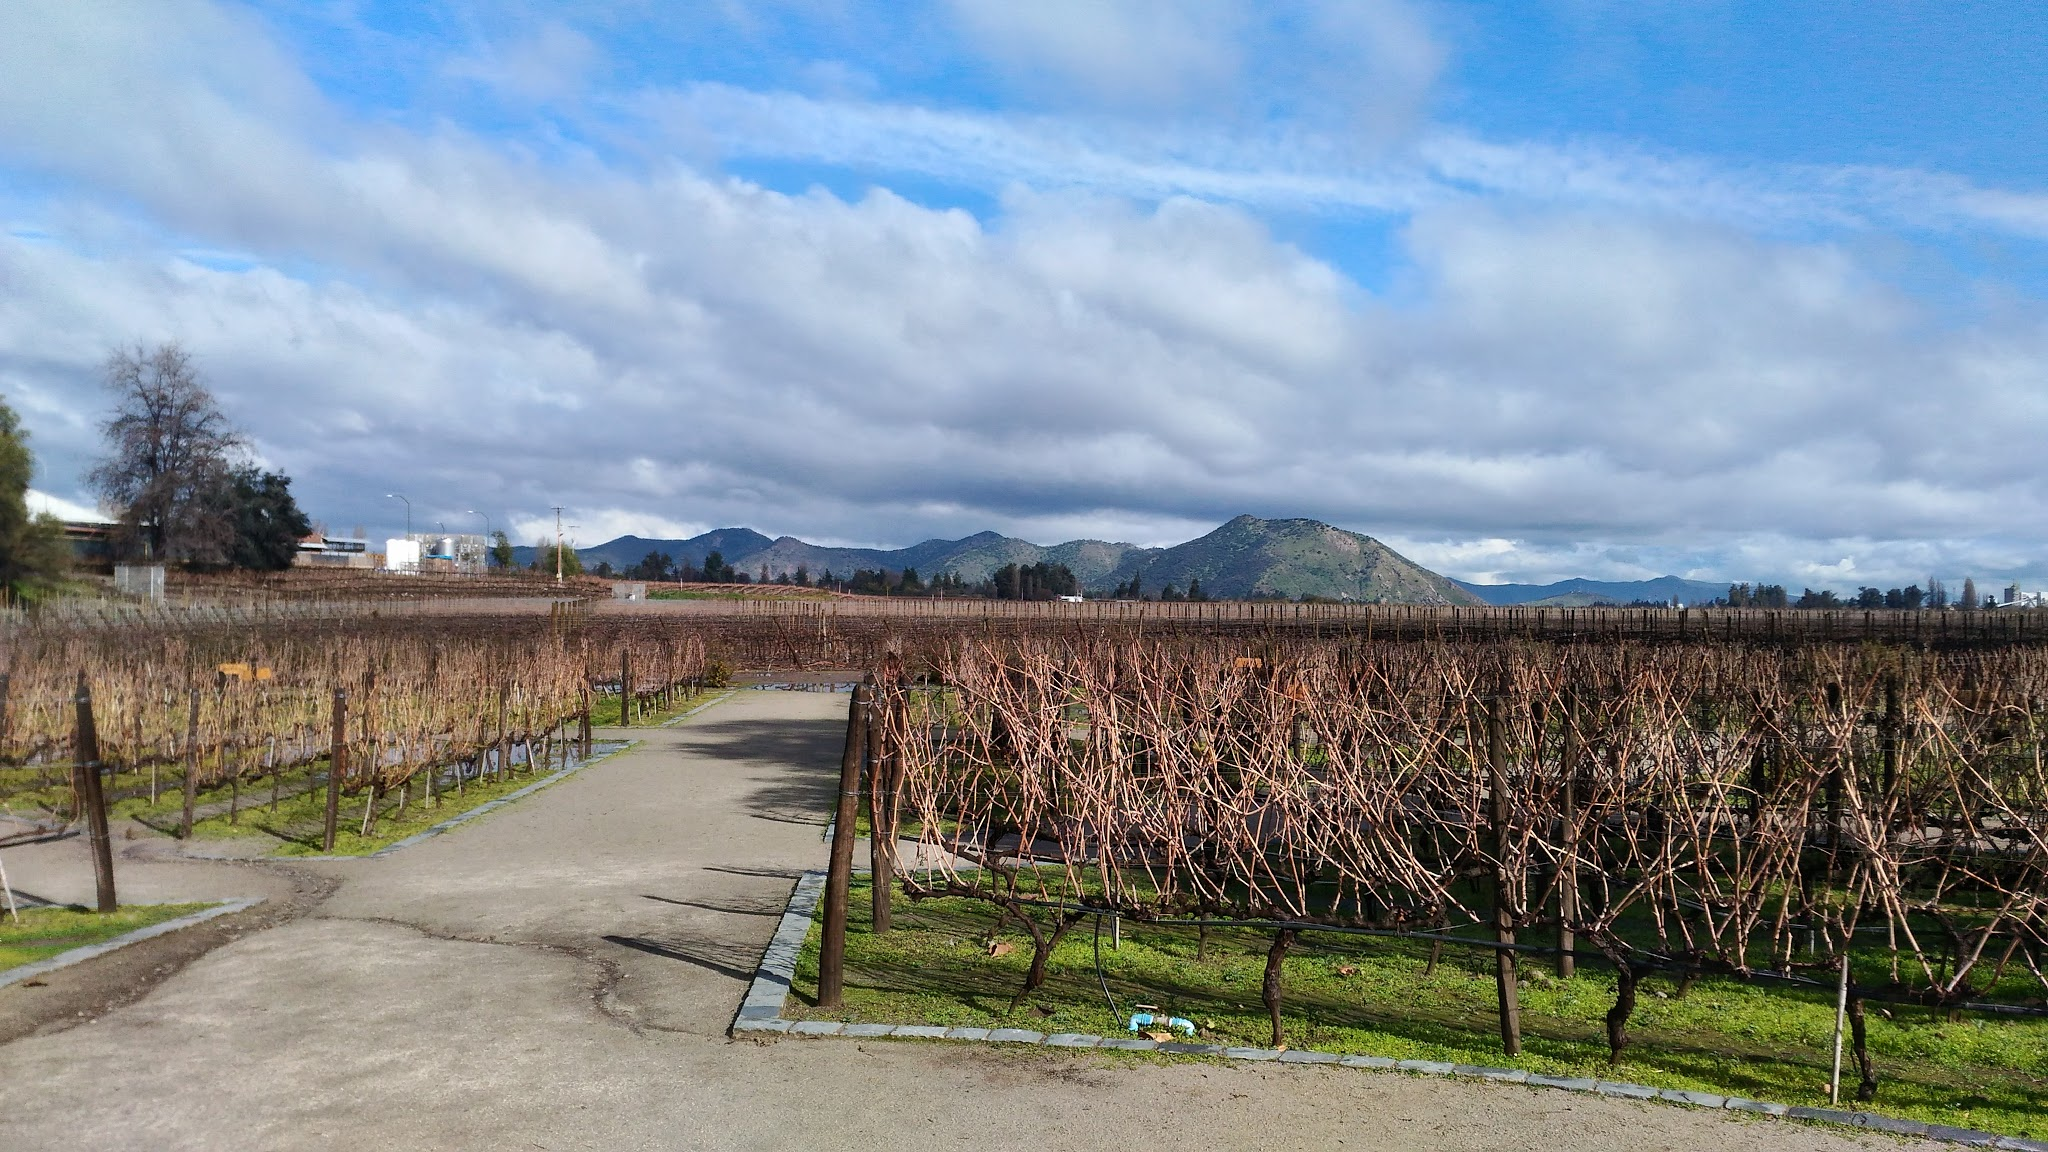 Plantação de uvas concha y toro